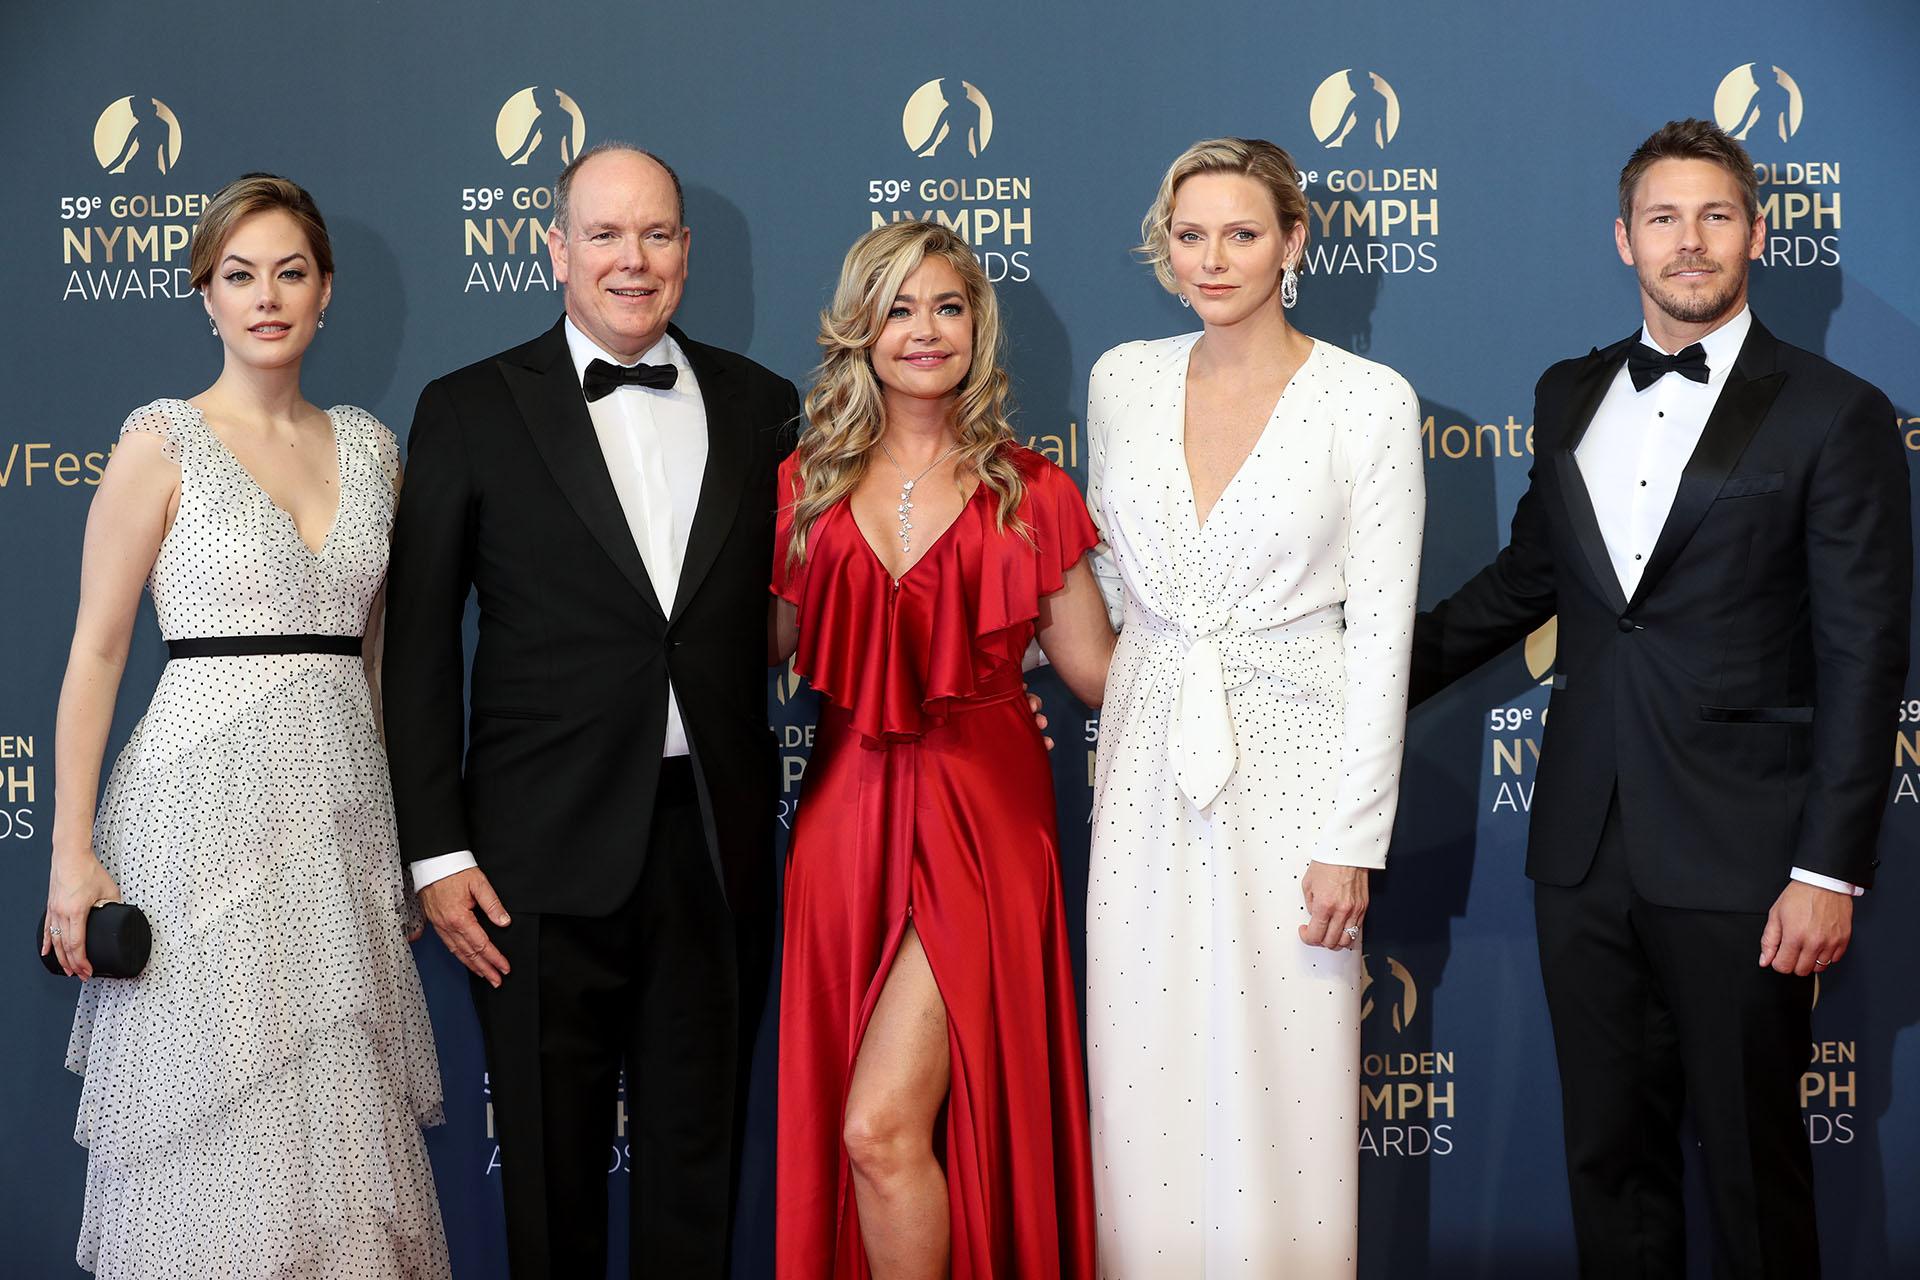 Annika Noelle, Alberto de Mónaco, Denise Richards, Charlene de Mónaco, y Scott Clifton /// Fotos: AFP